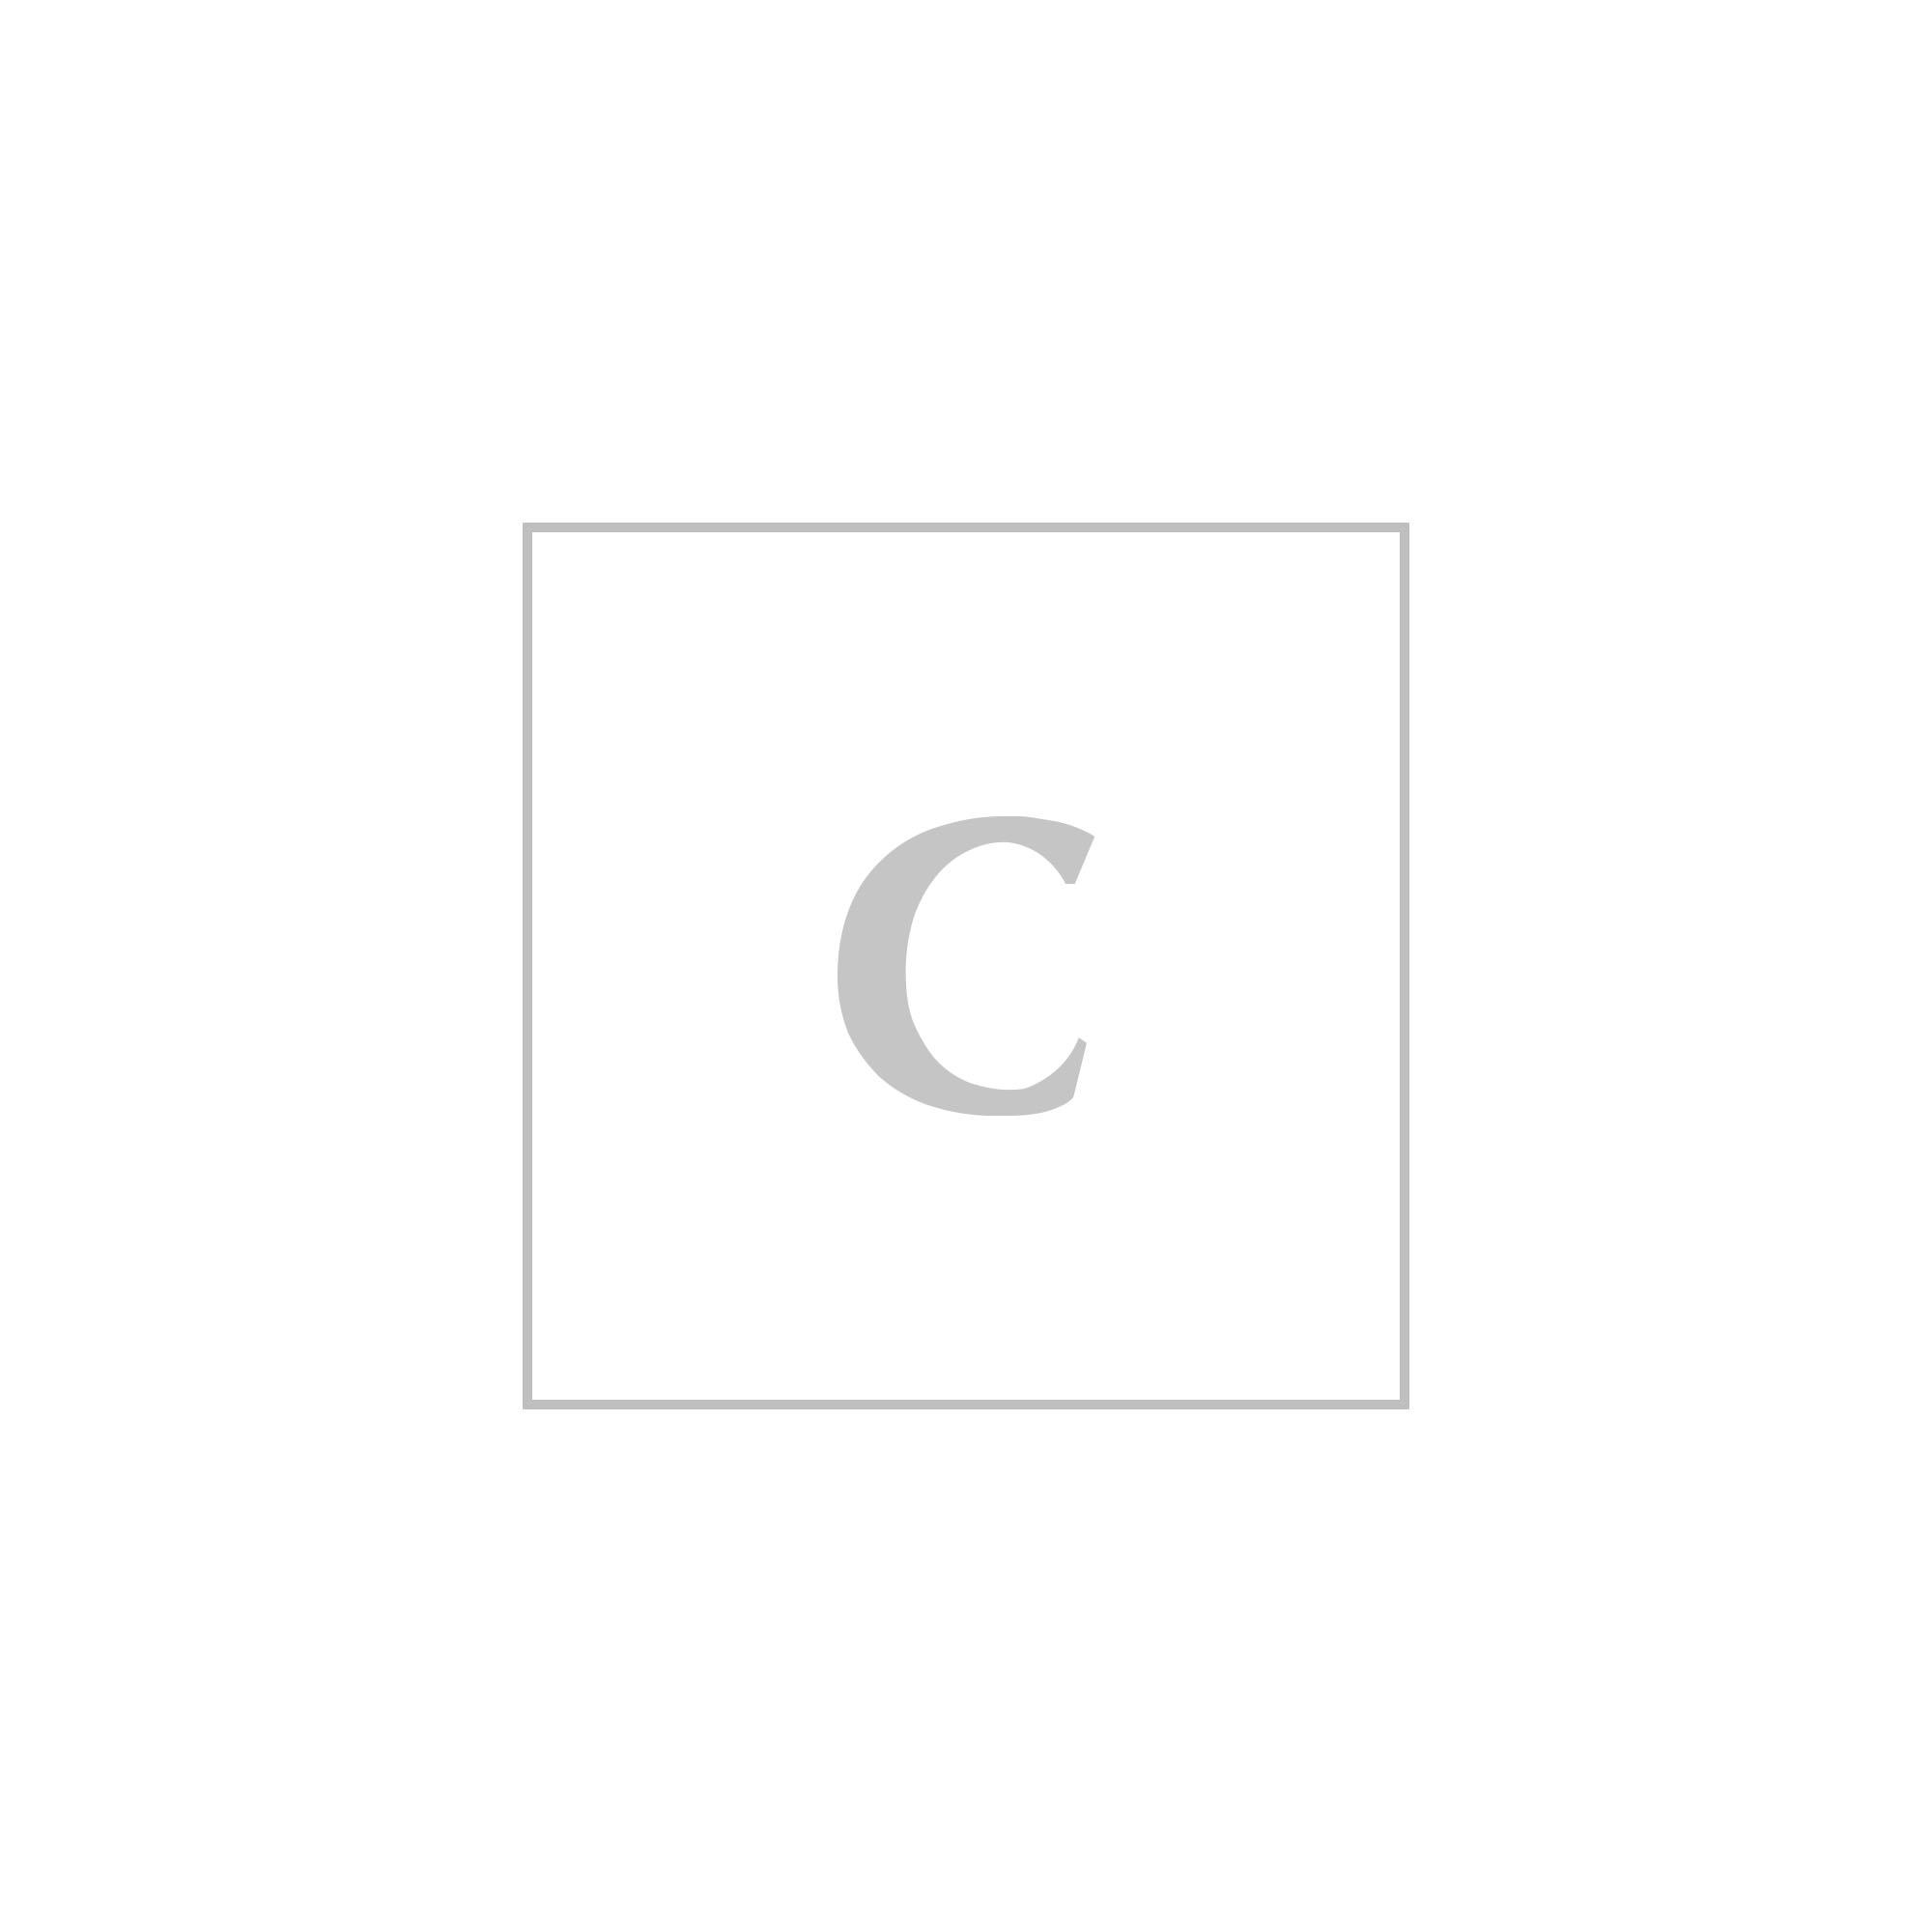 Saint laurent ysl monogram minibag